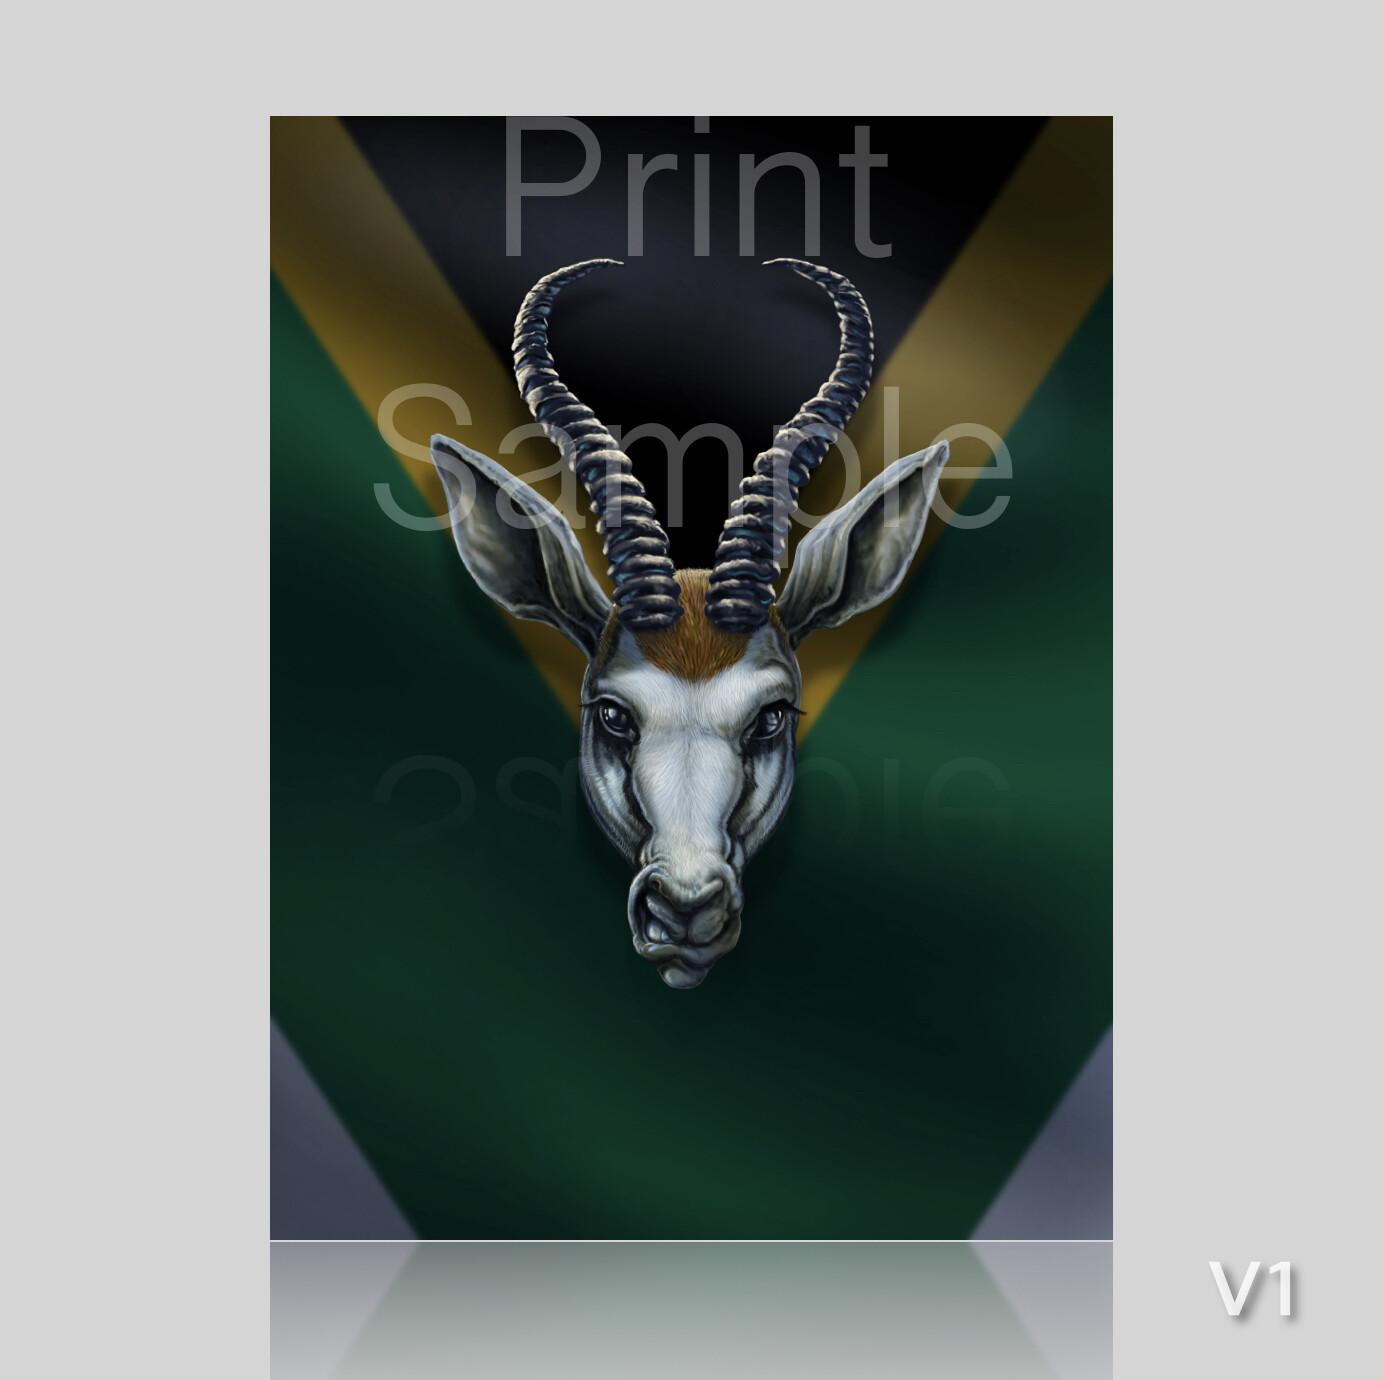 Springbok SA - Archival Quality prints - Choose from 2 versions